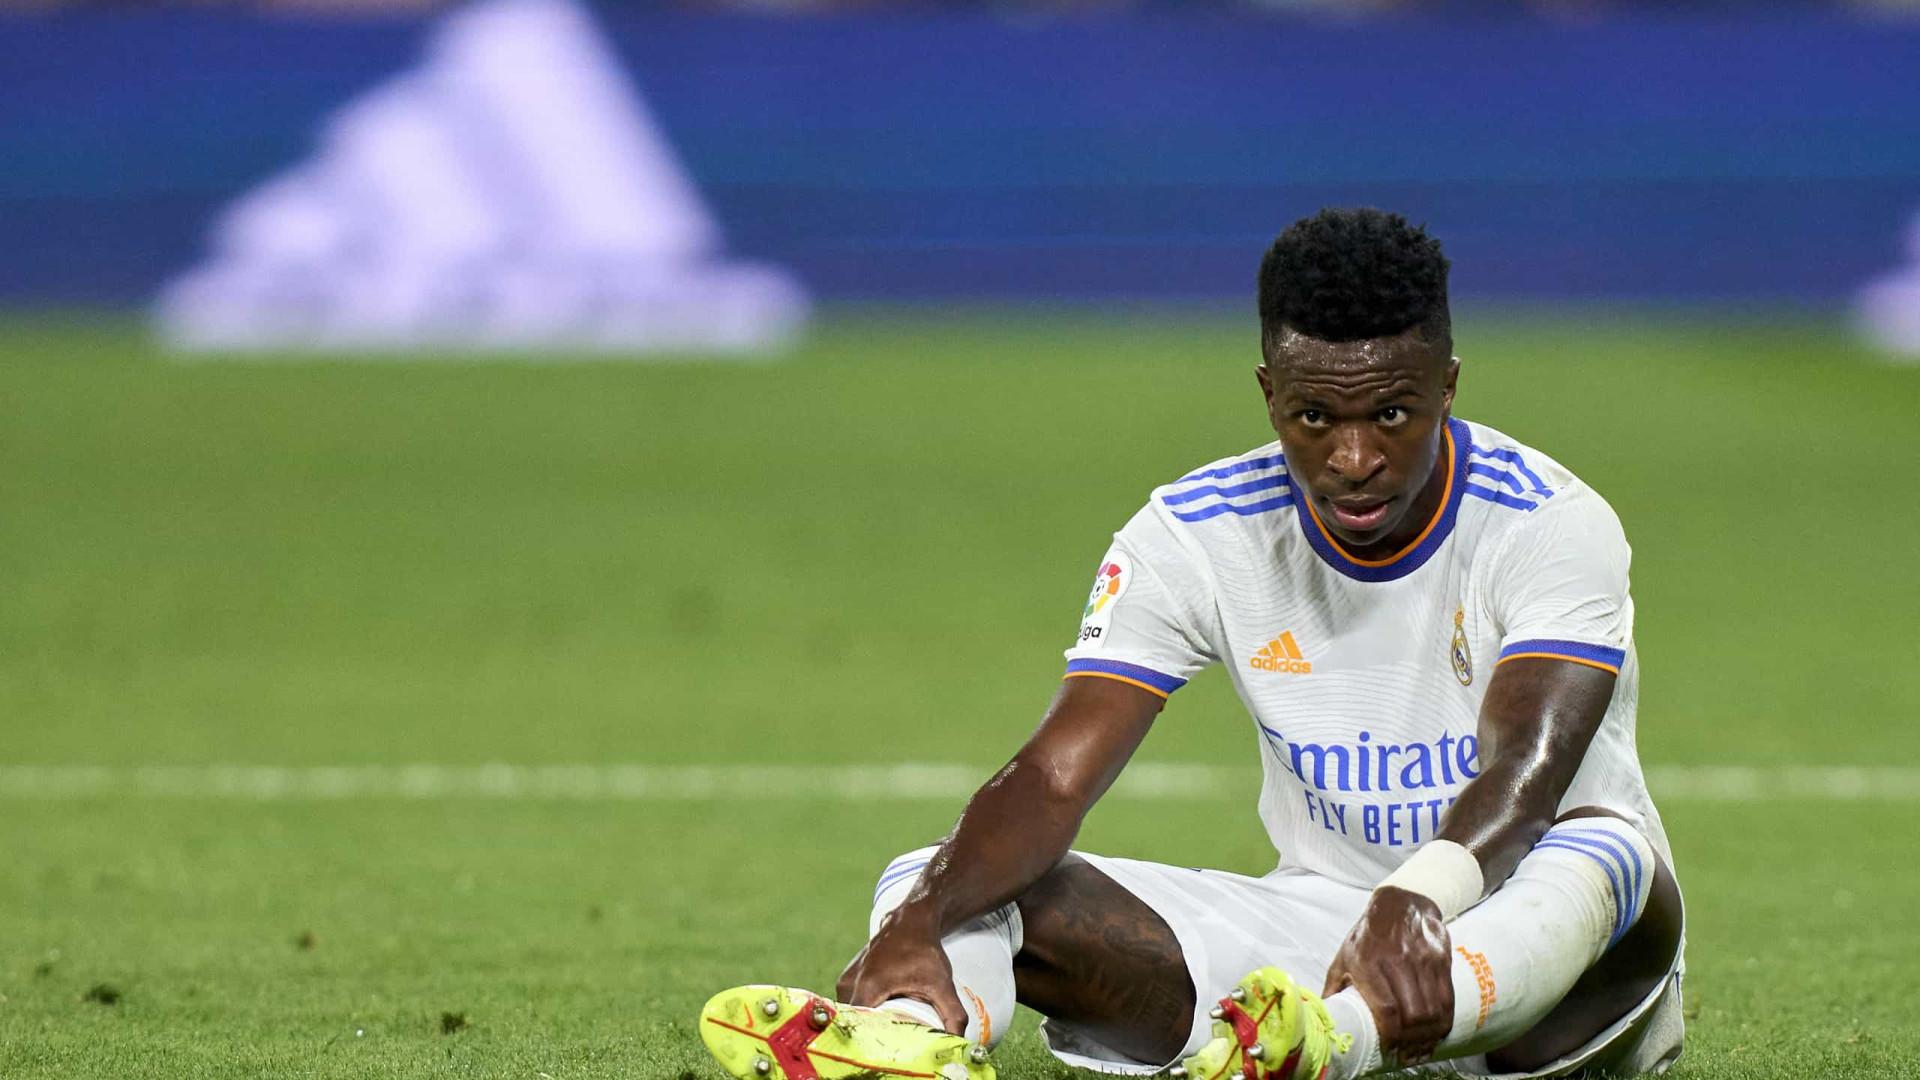 Vinicius Junior comemora boa fase no Real Madrid: 'Me sinto bem comigo mesmo'